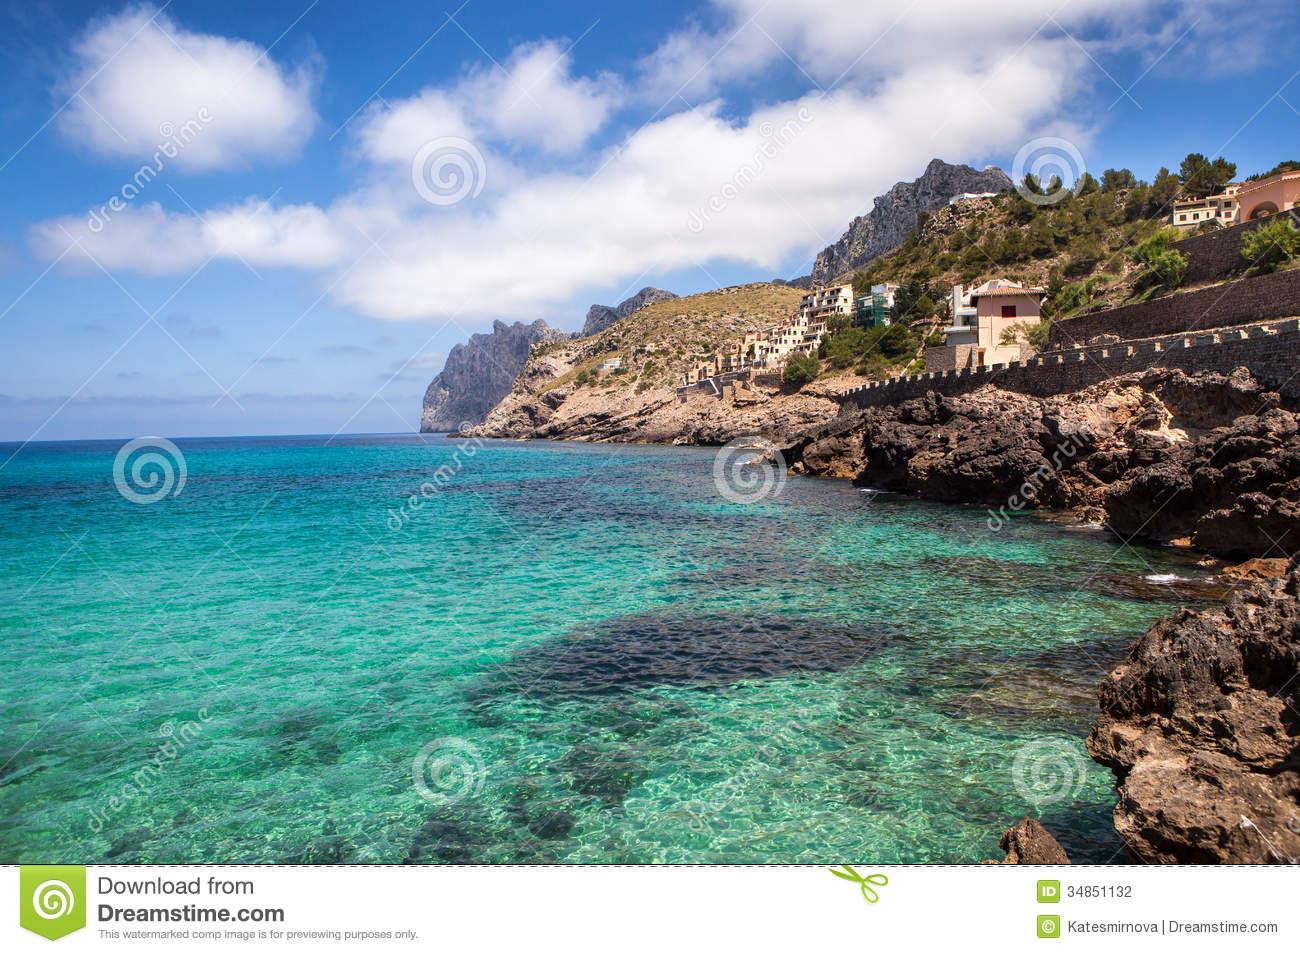 Blue Lagoon Coast Mallorca Stock Photos, Images, & Pictures.